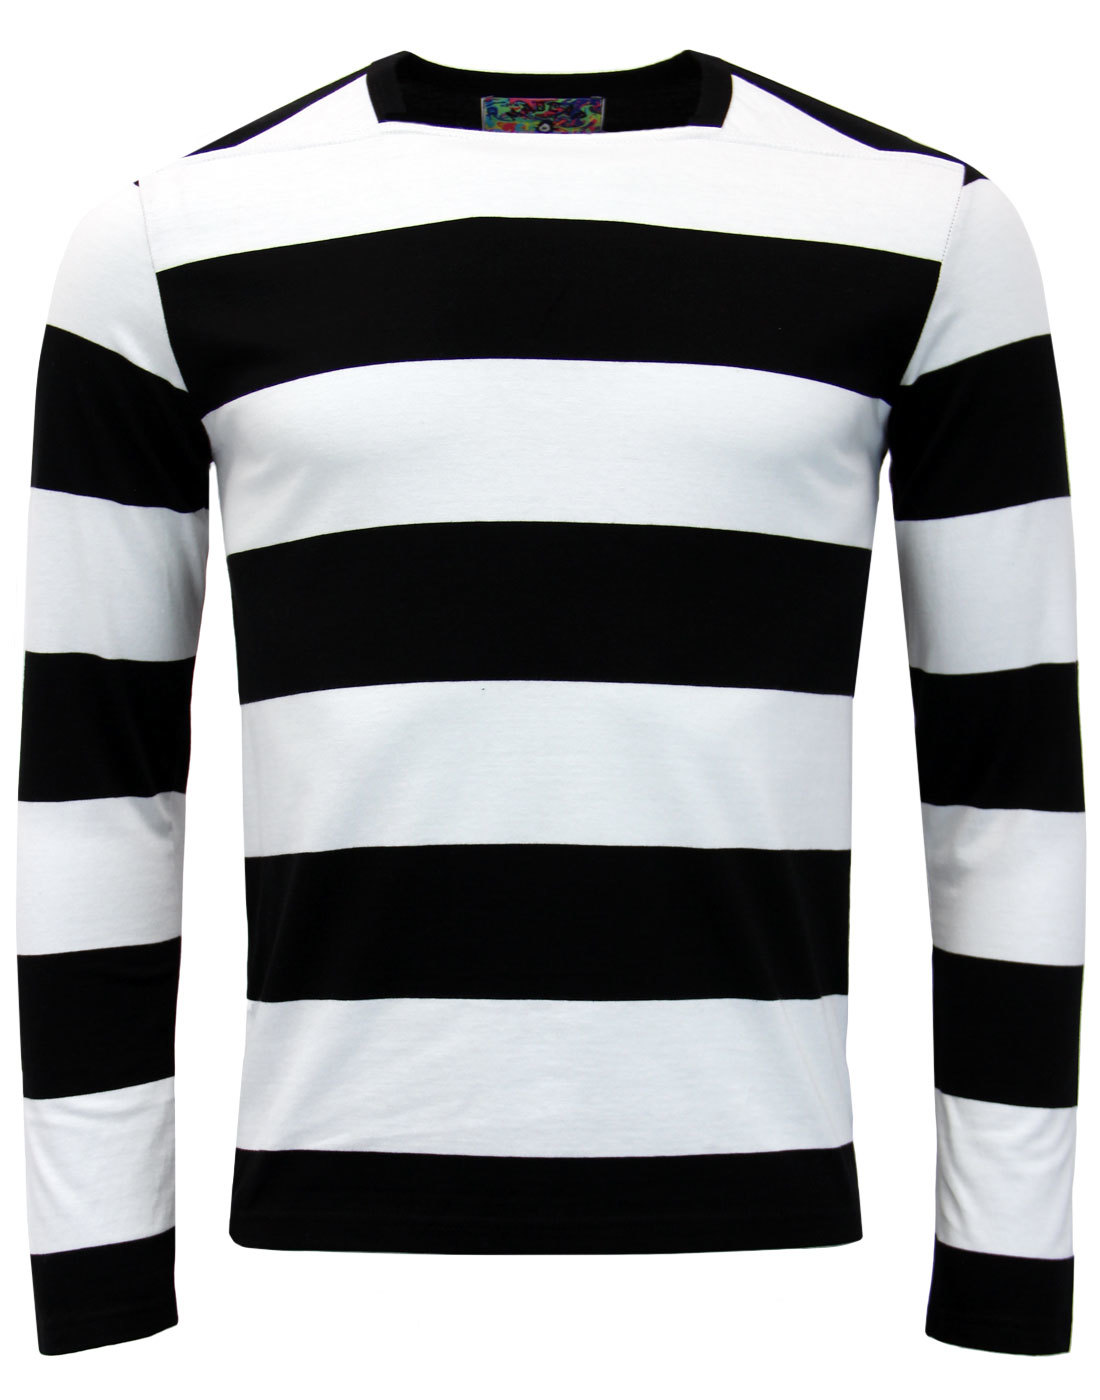 1c96868cb9b22 Ally Pally - Mens Retro 60s Mod Brian Jones Style Straight Neck T-Shirt